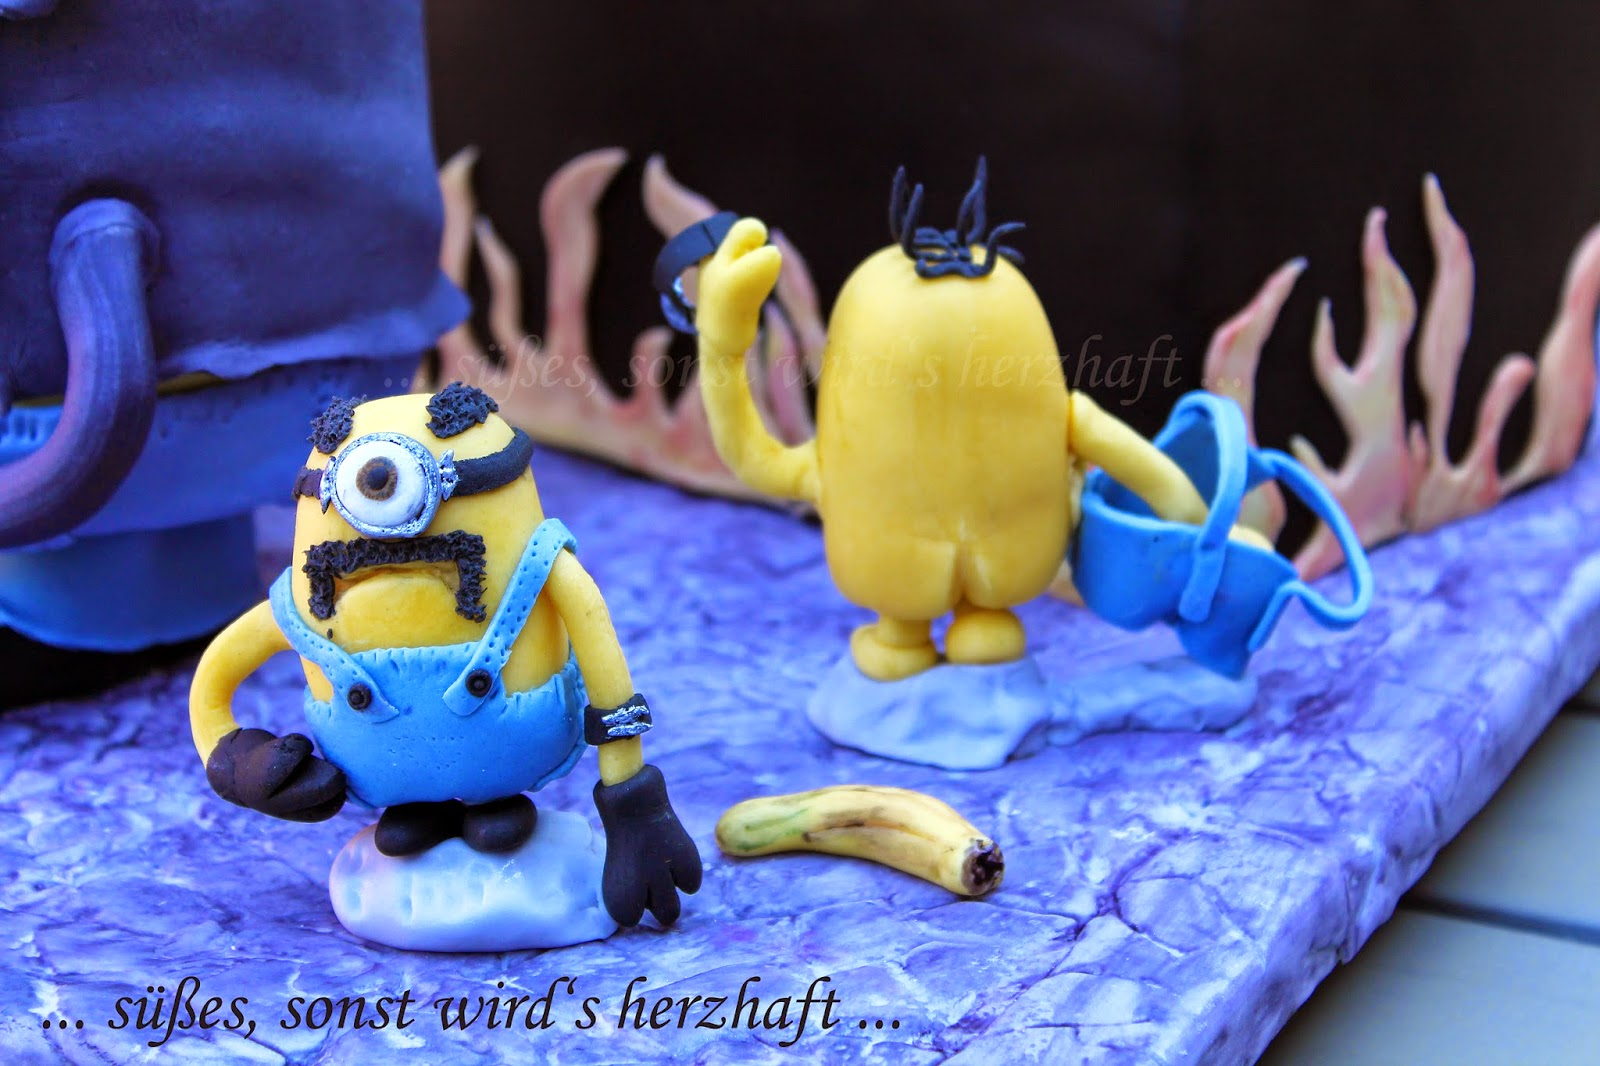 Mini Kühlschrank Rockstar : Süßes sonst wirds herzhaft..: rockstar ♫ minions